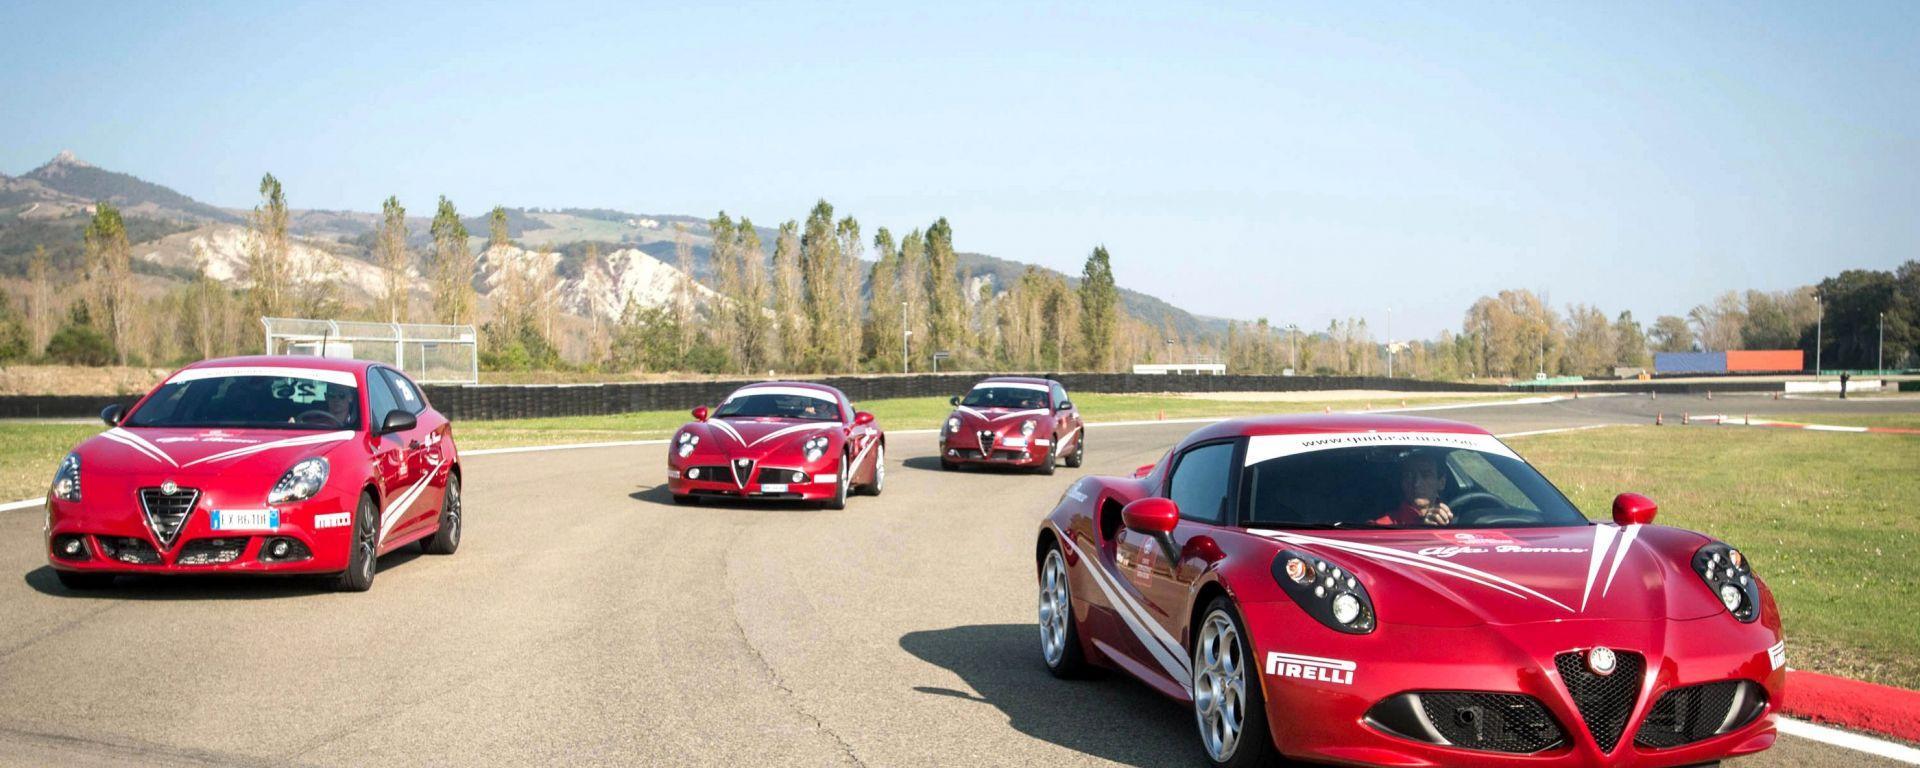 Alfa Romeo Drive Experience: Guida Evoluta